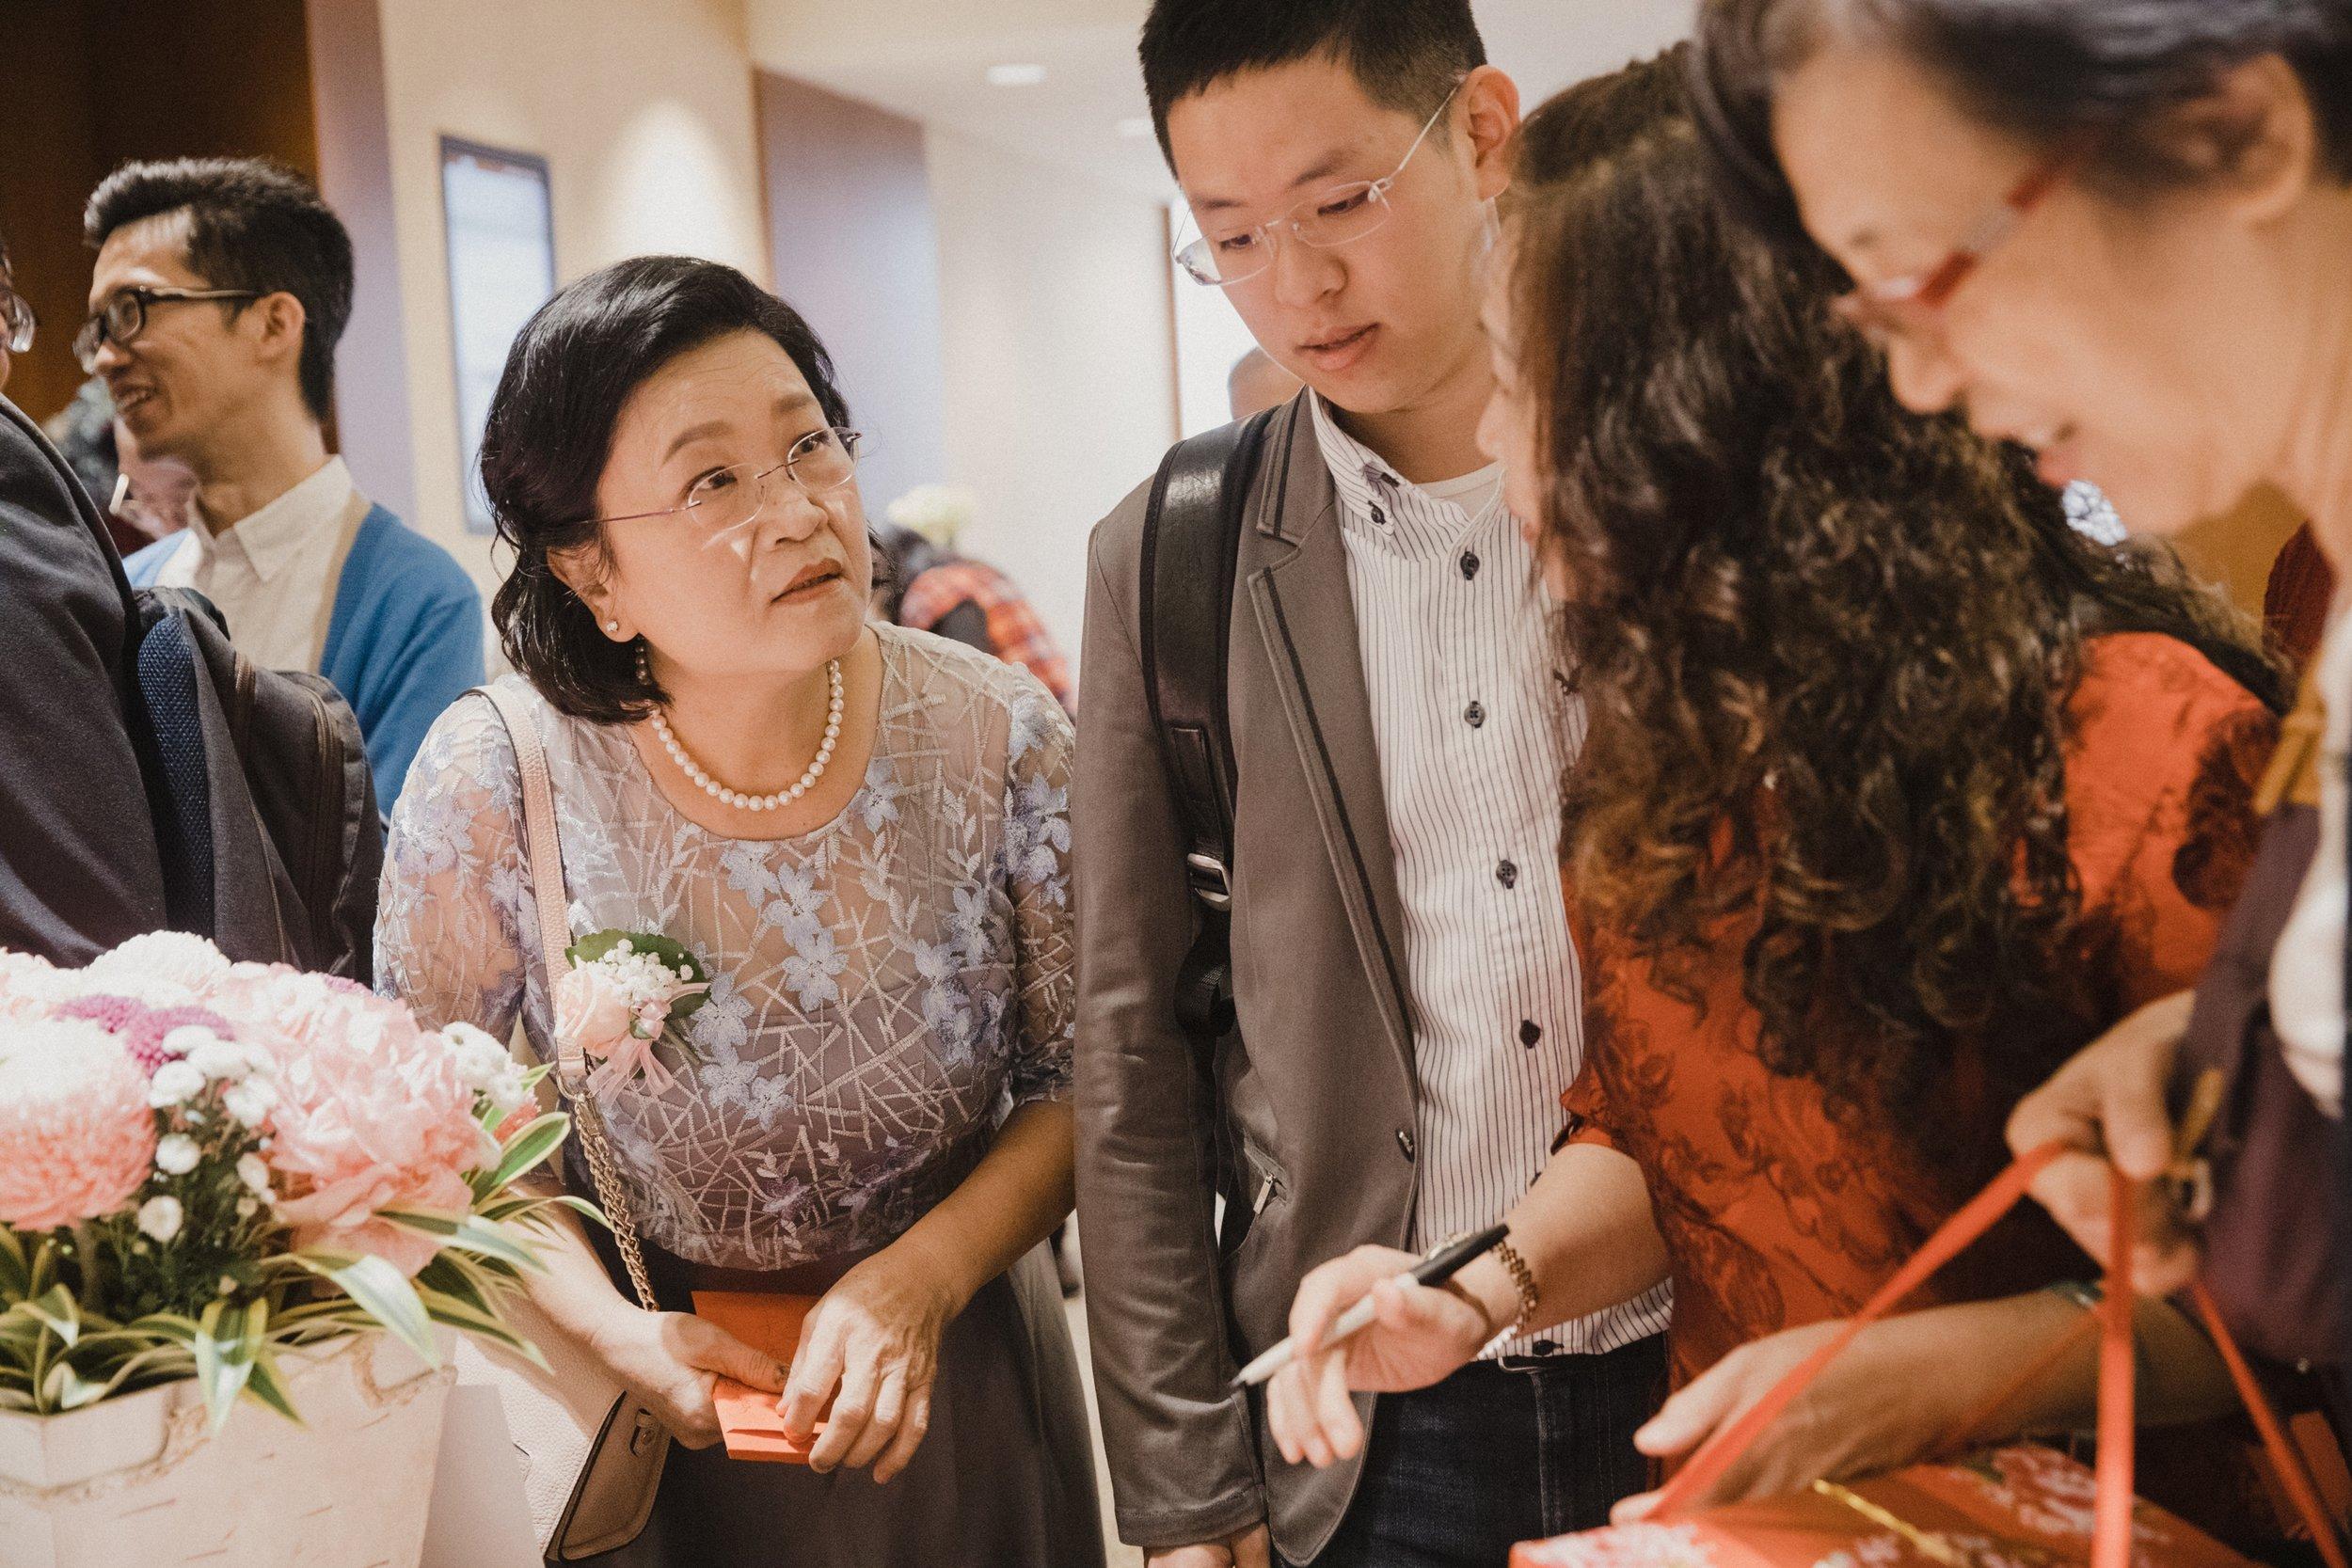 wedding-caridee-oscar-lunch-ambassador-hsinchu-結婚午宴-新竹國賓_47.jpg